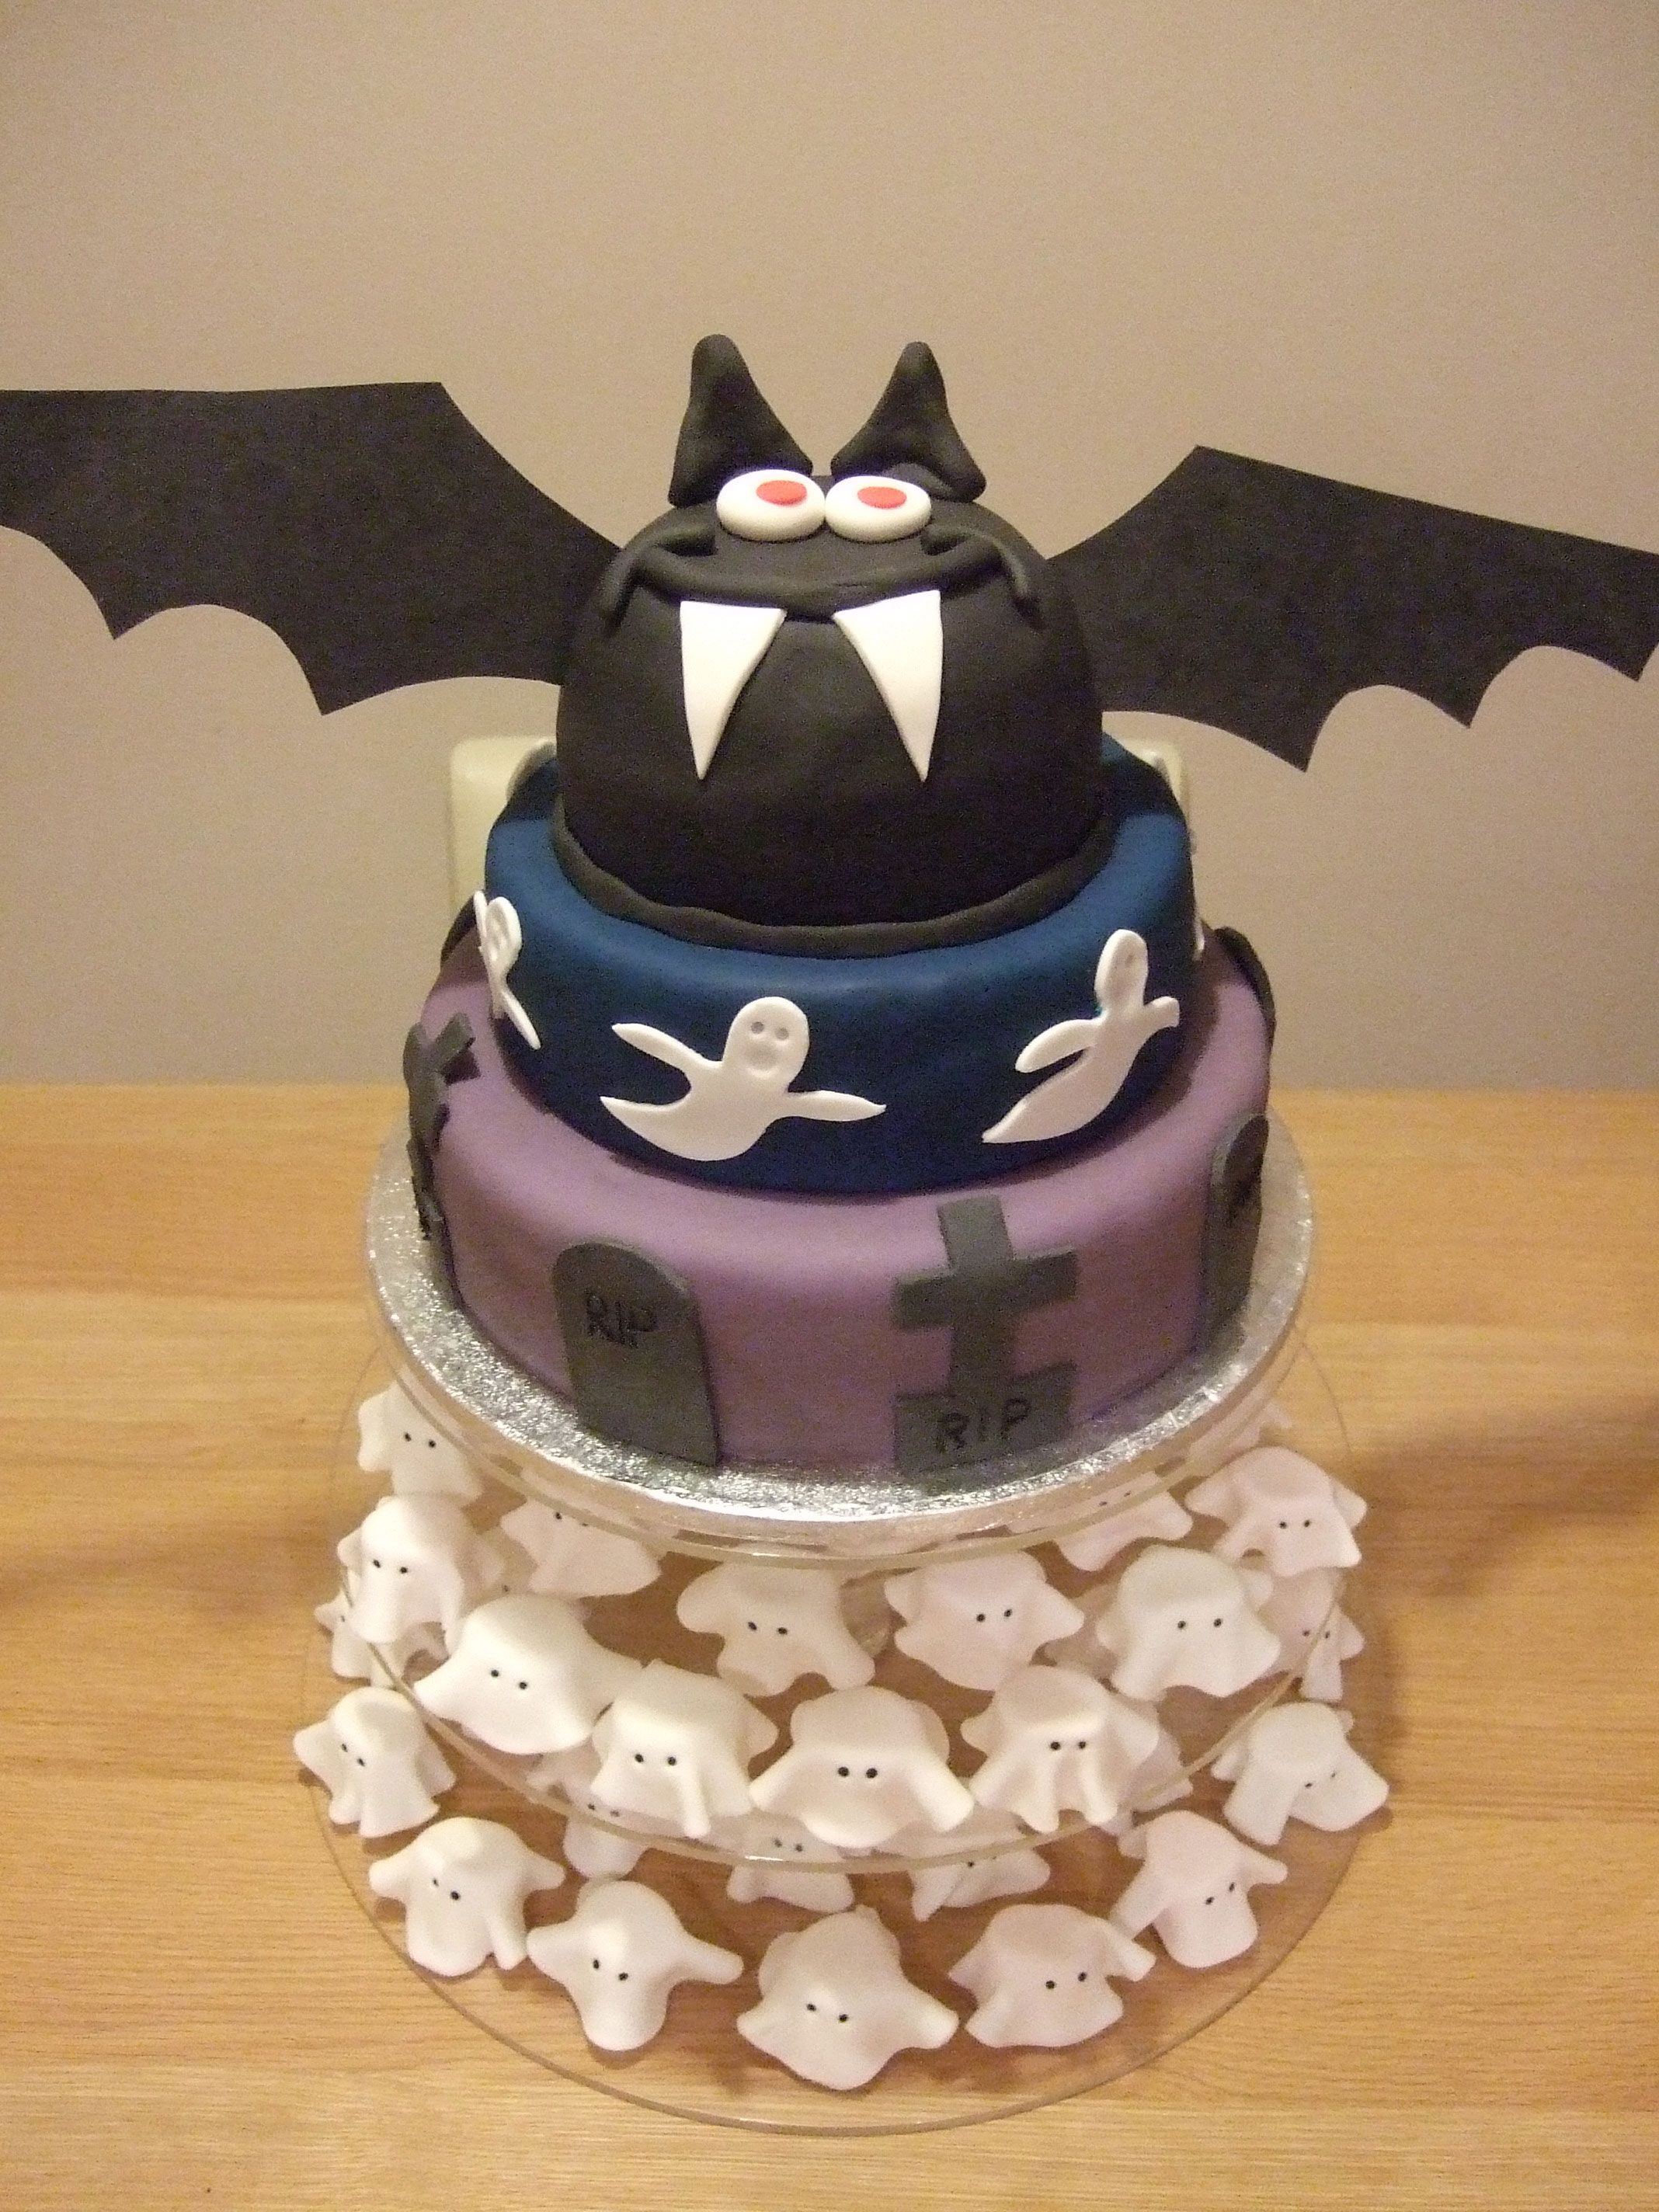 Asda good living cake cake competition bat cake